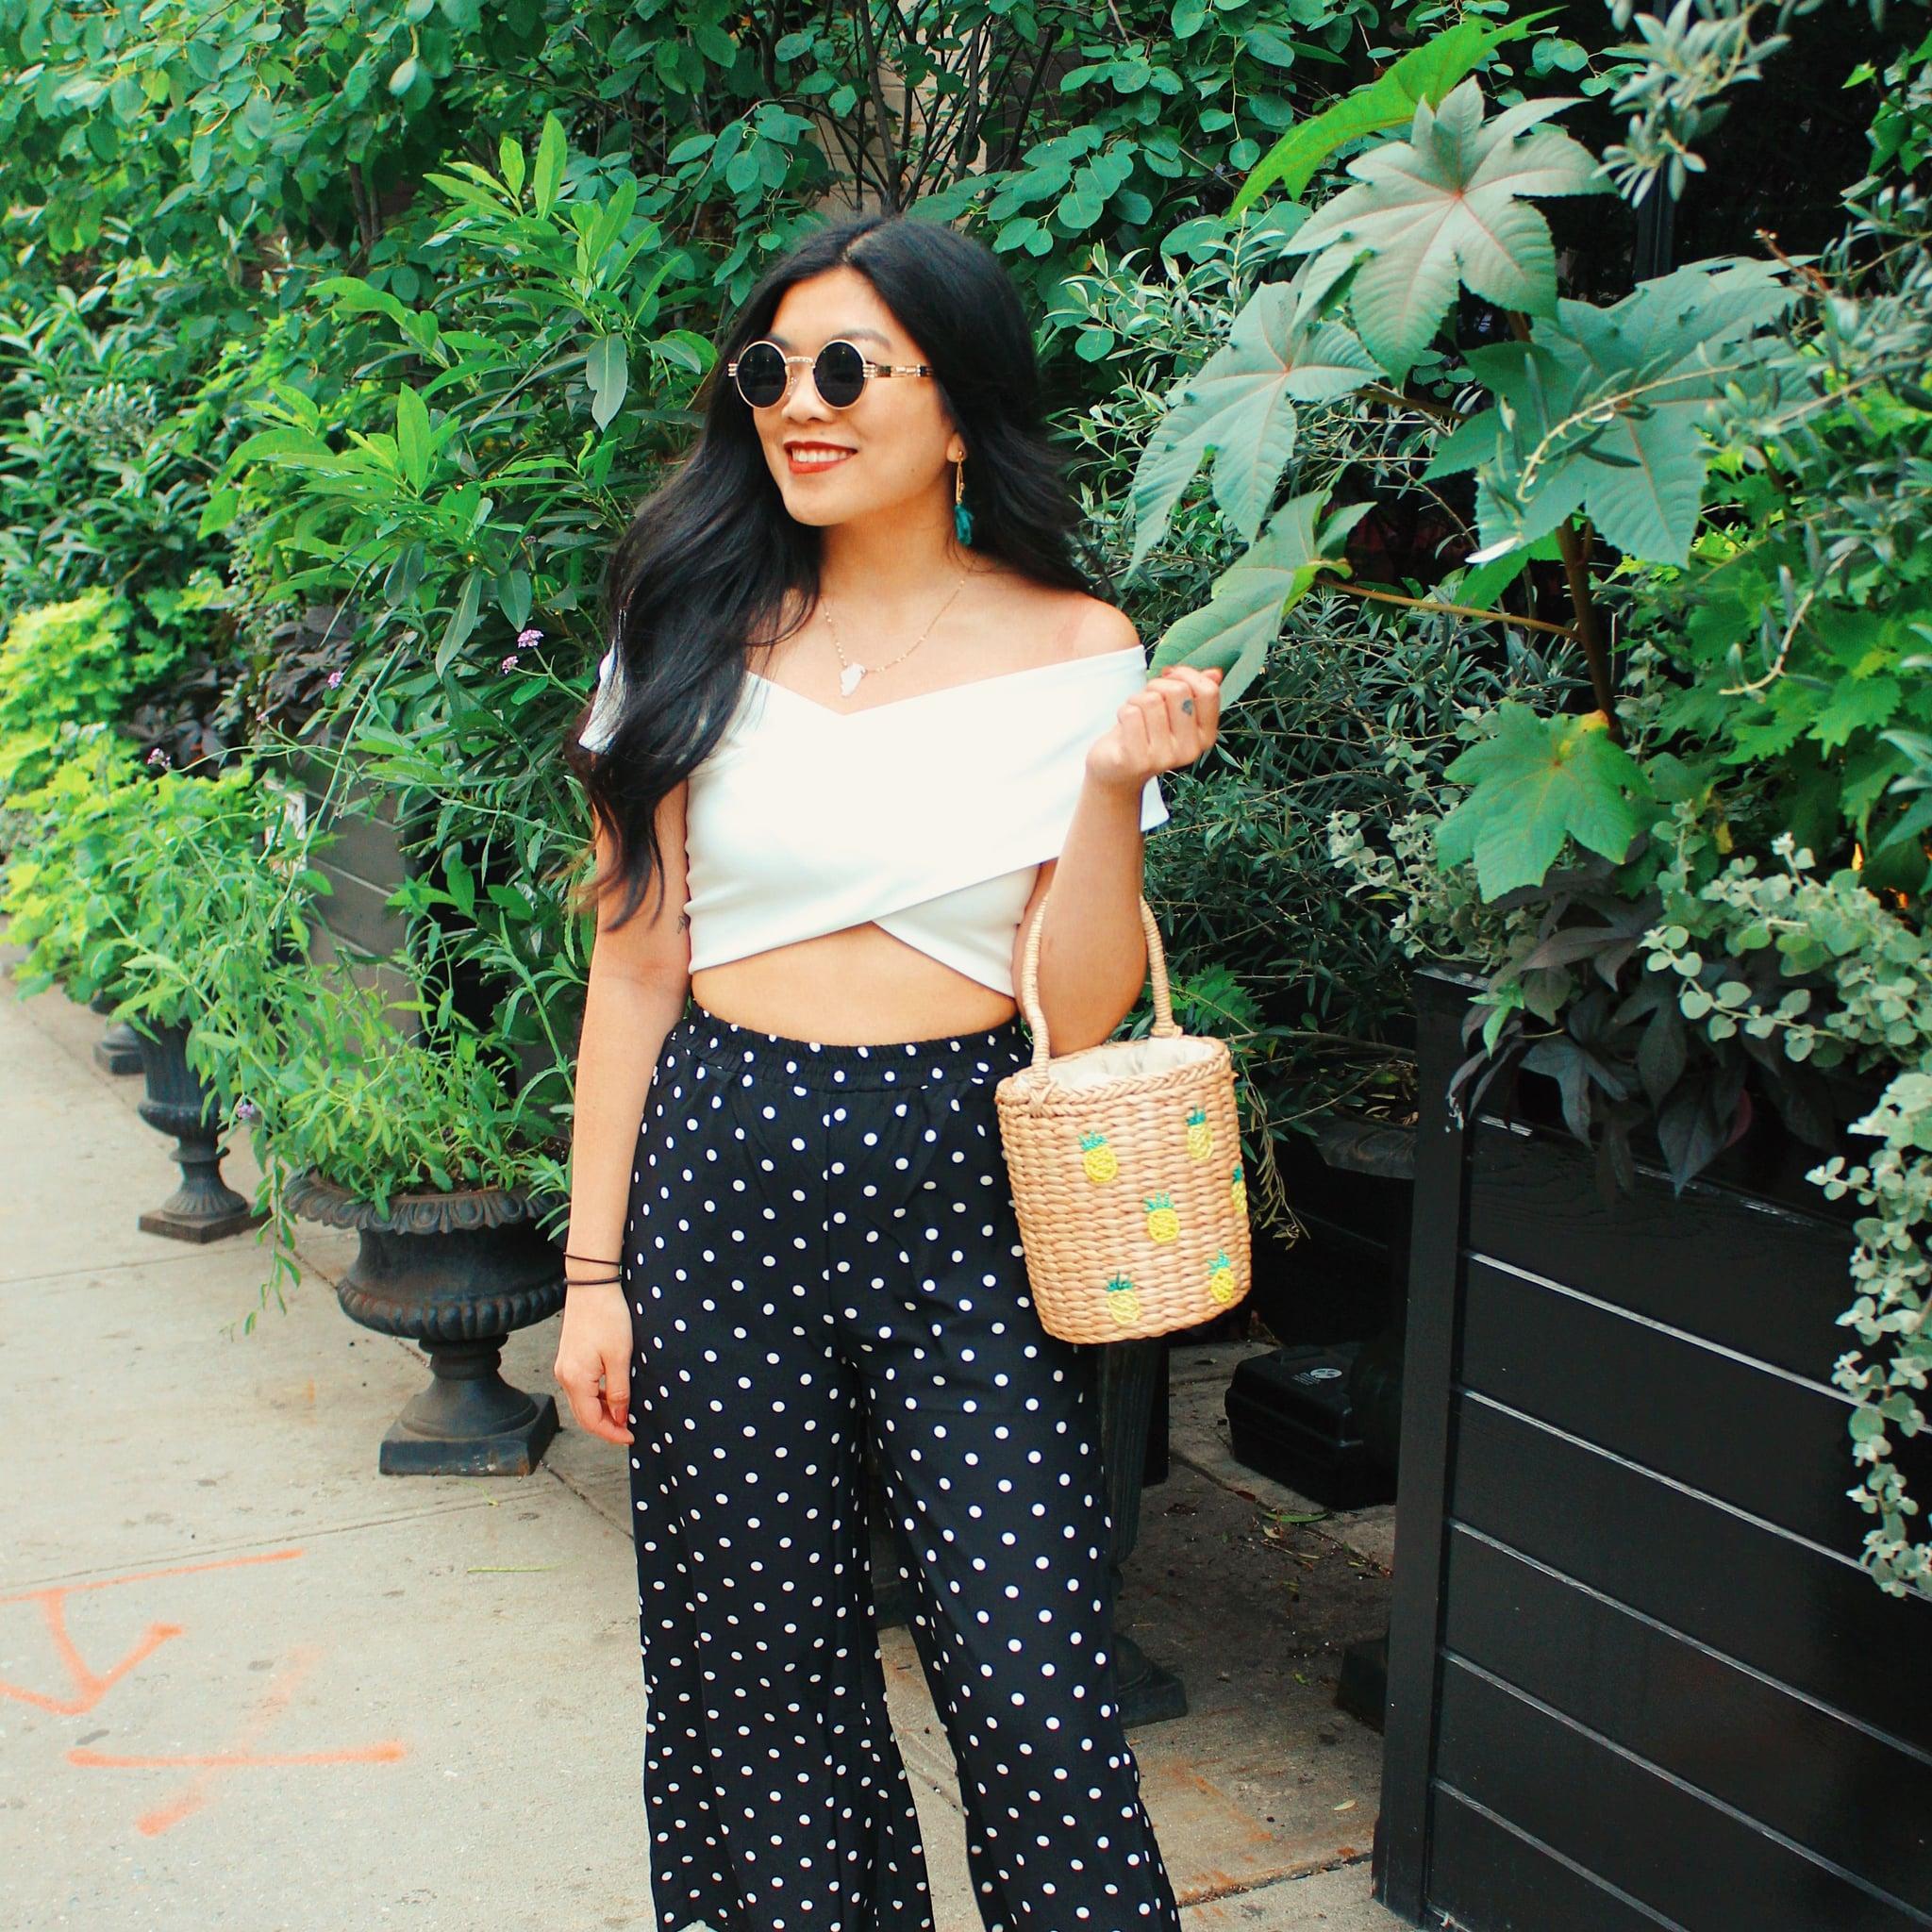 e69c38d783 Shein Review | POPSUGAR Fashion